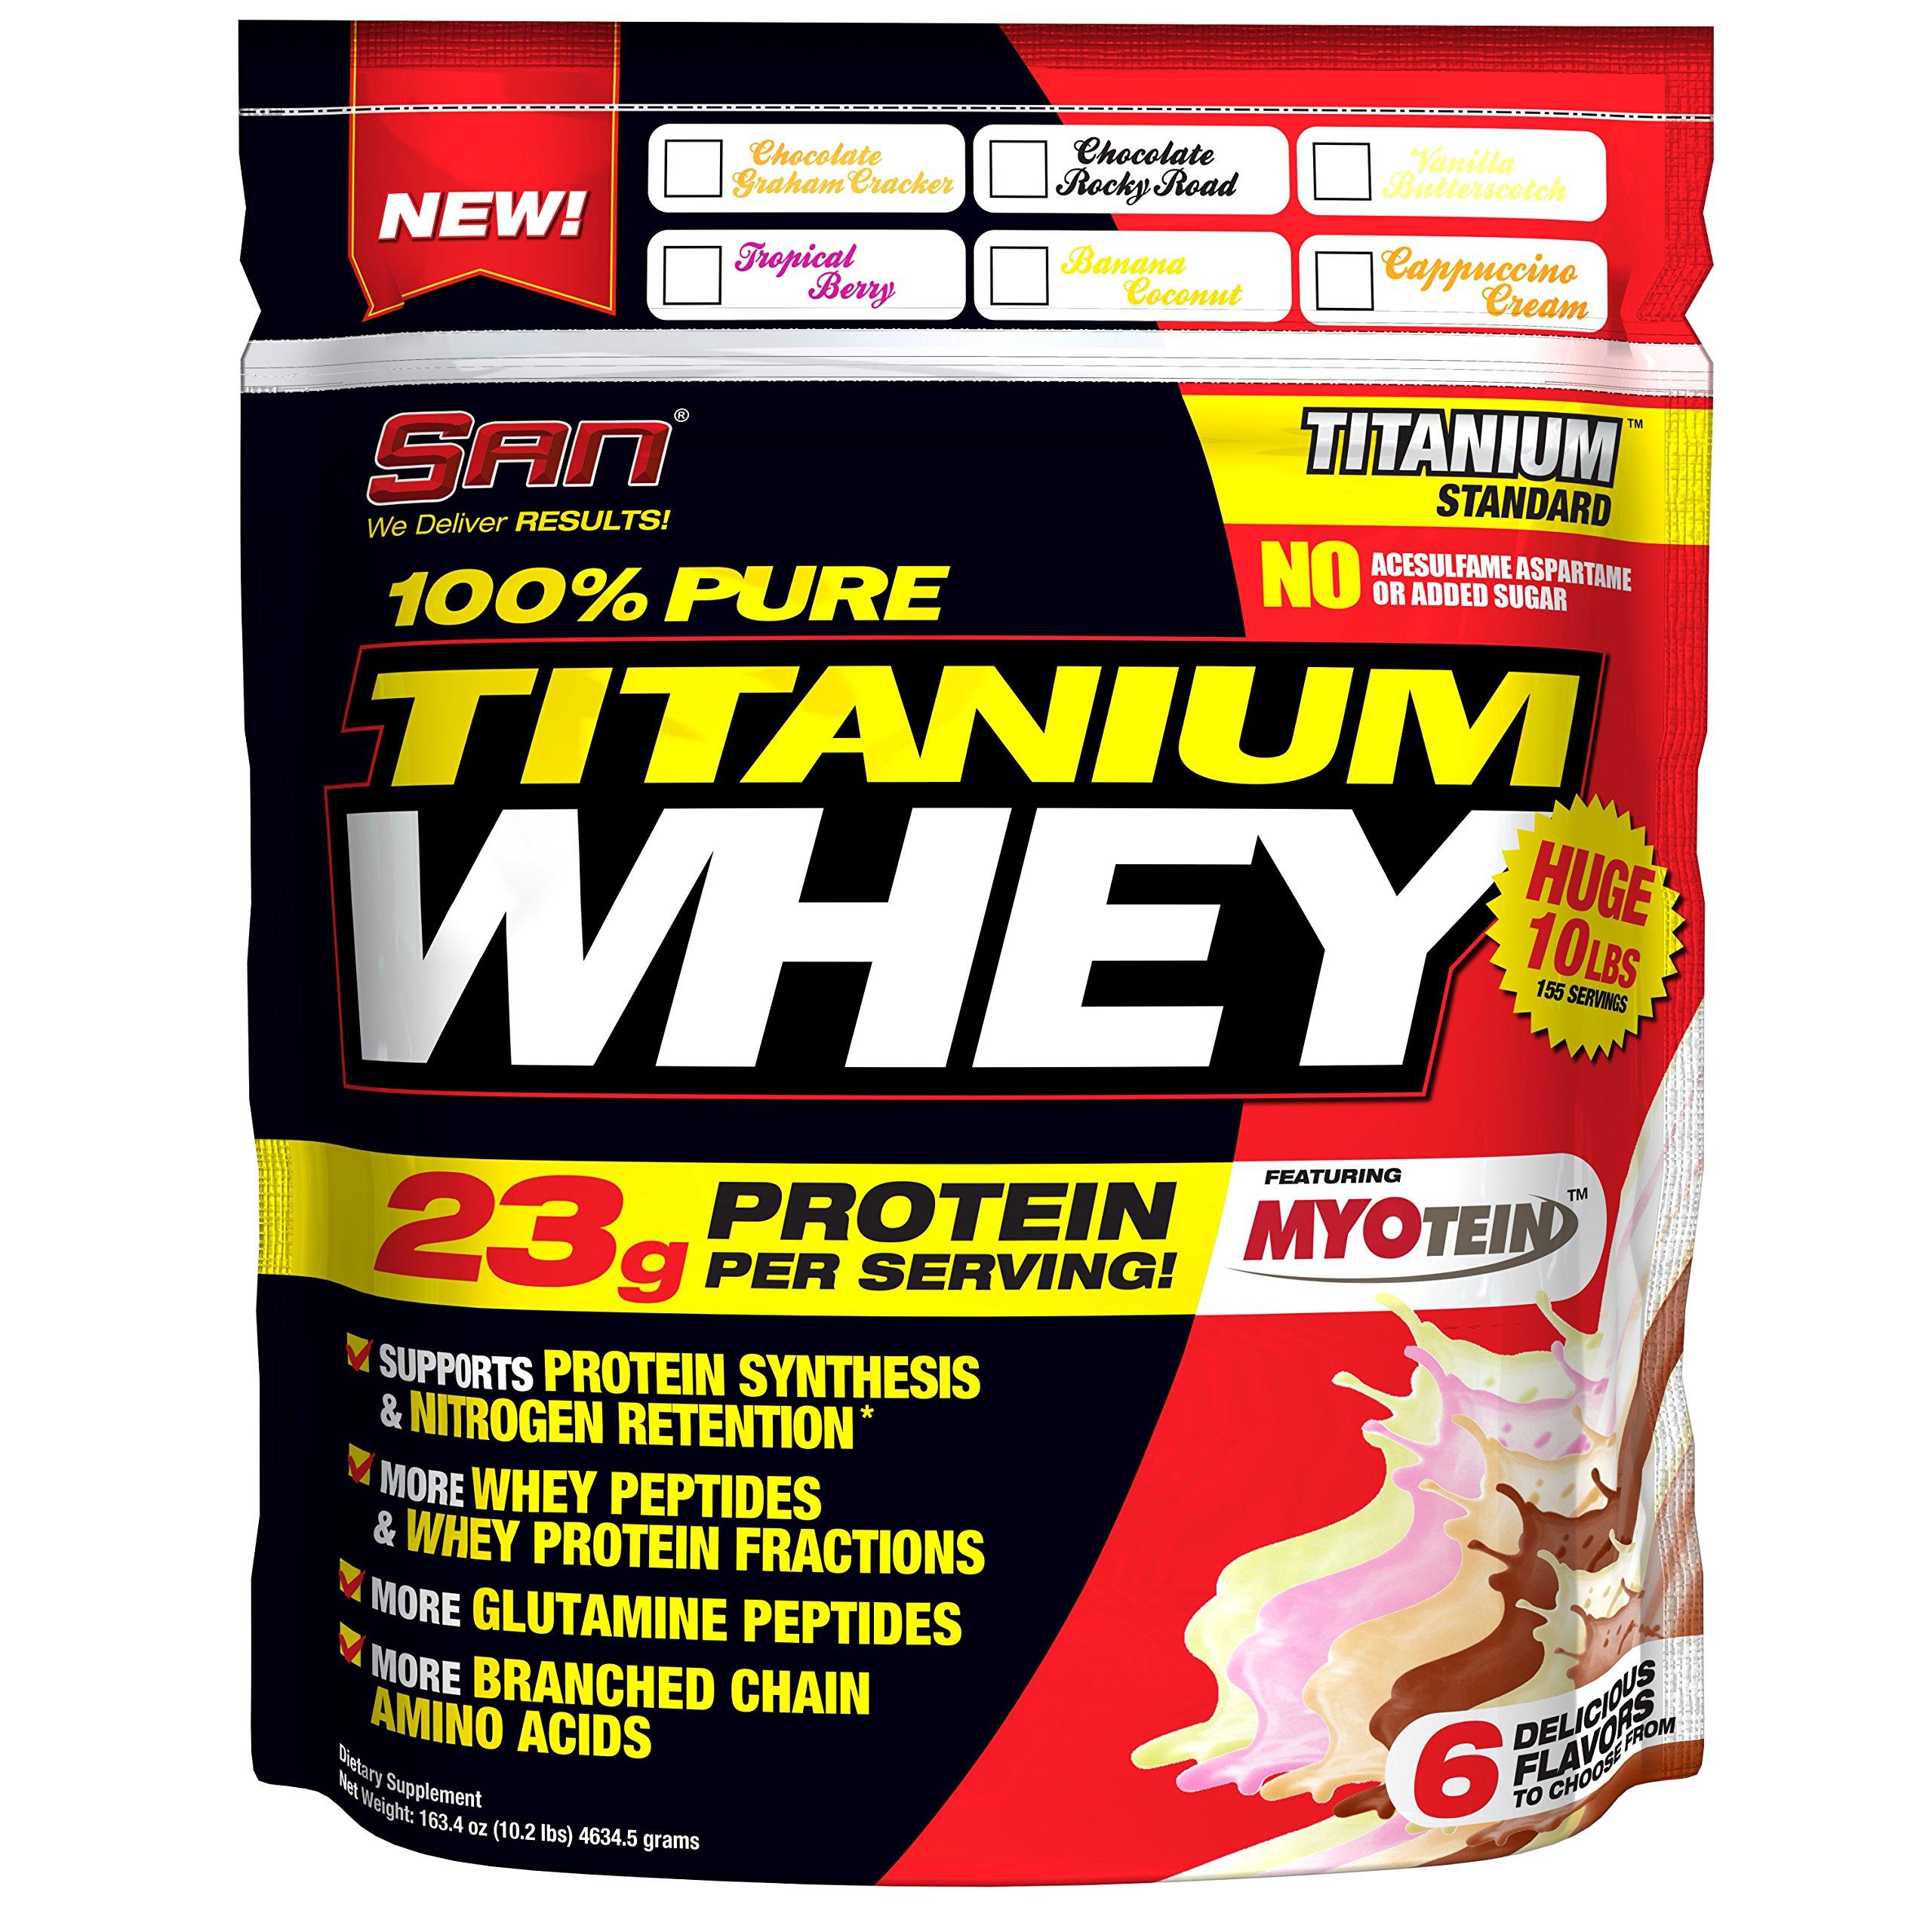 SAN Nutrition 100% Pure Titanium Whey Protein Powder, Chocolate Rocky Road, 10 Pounds